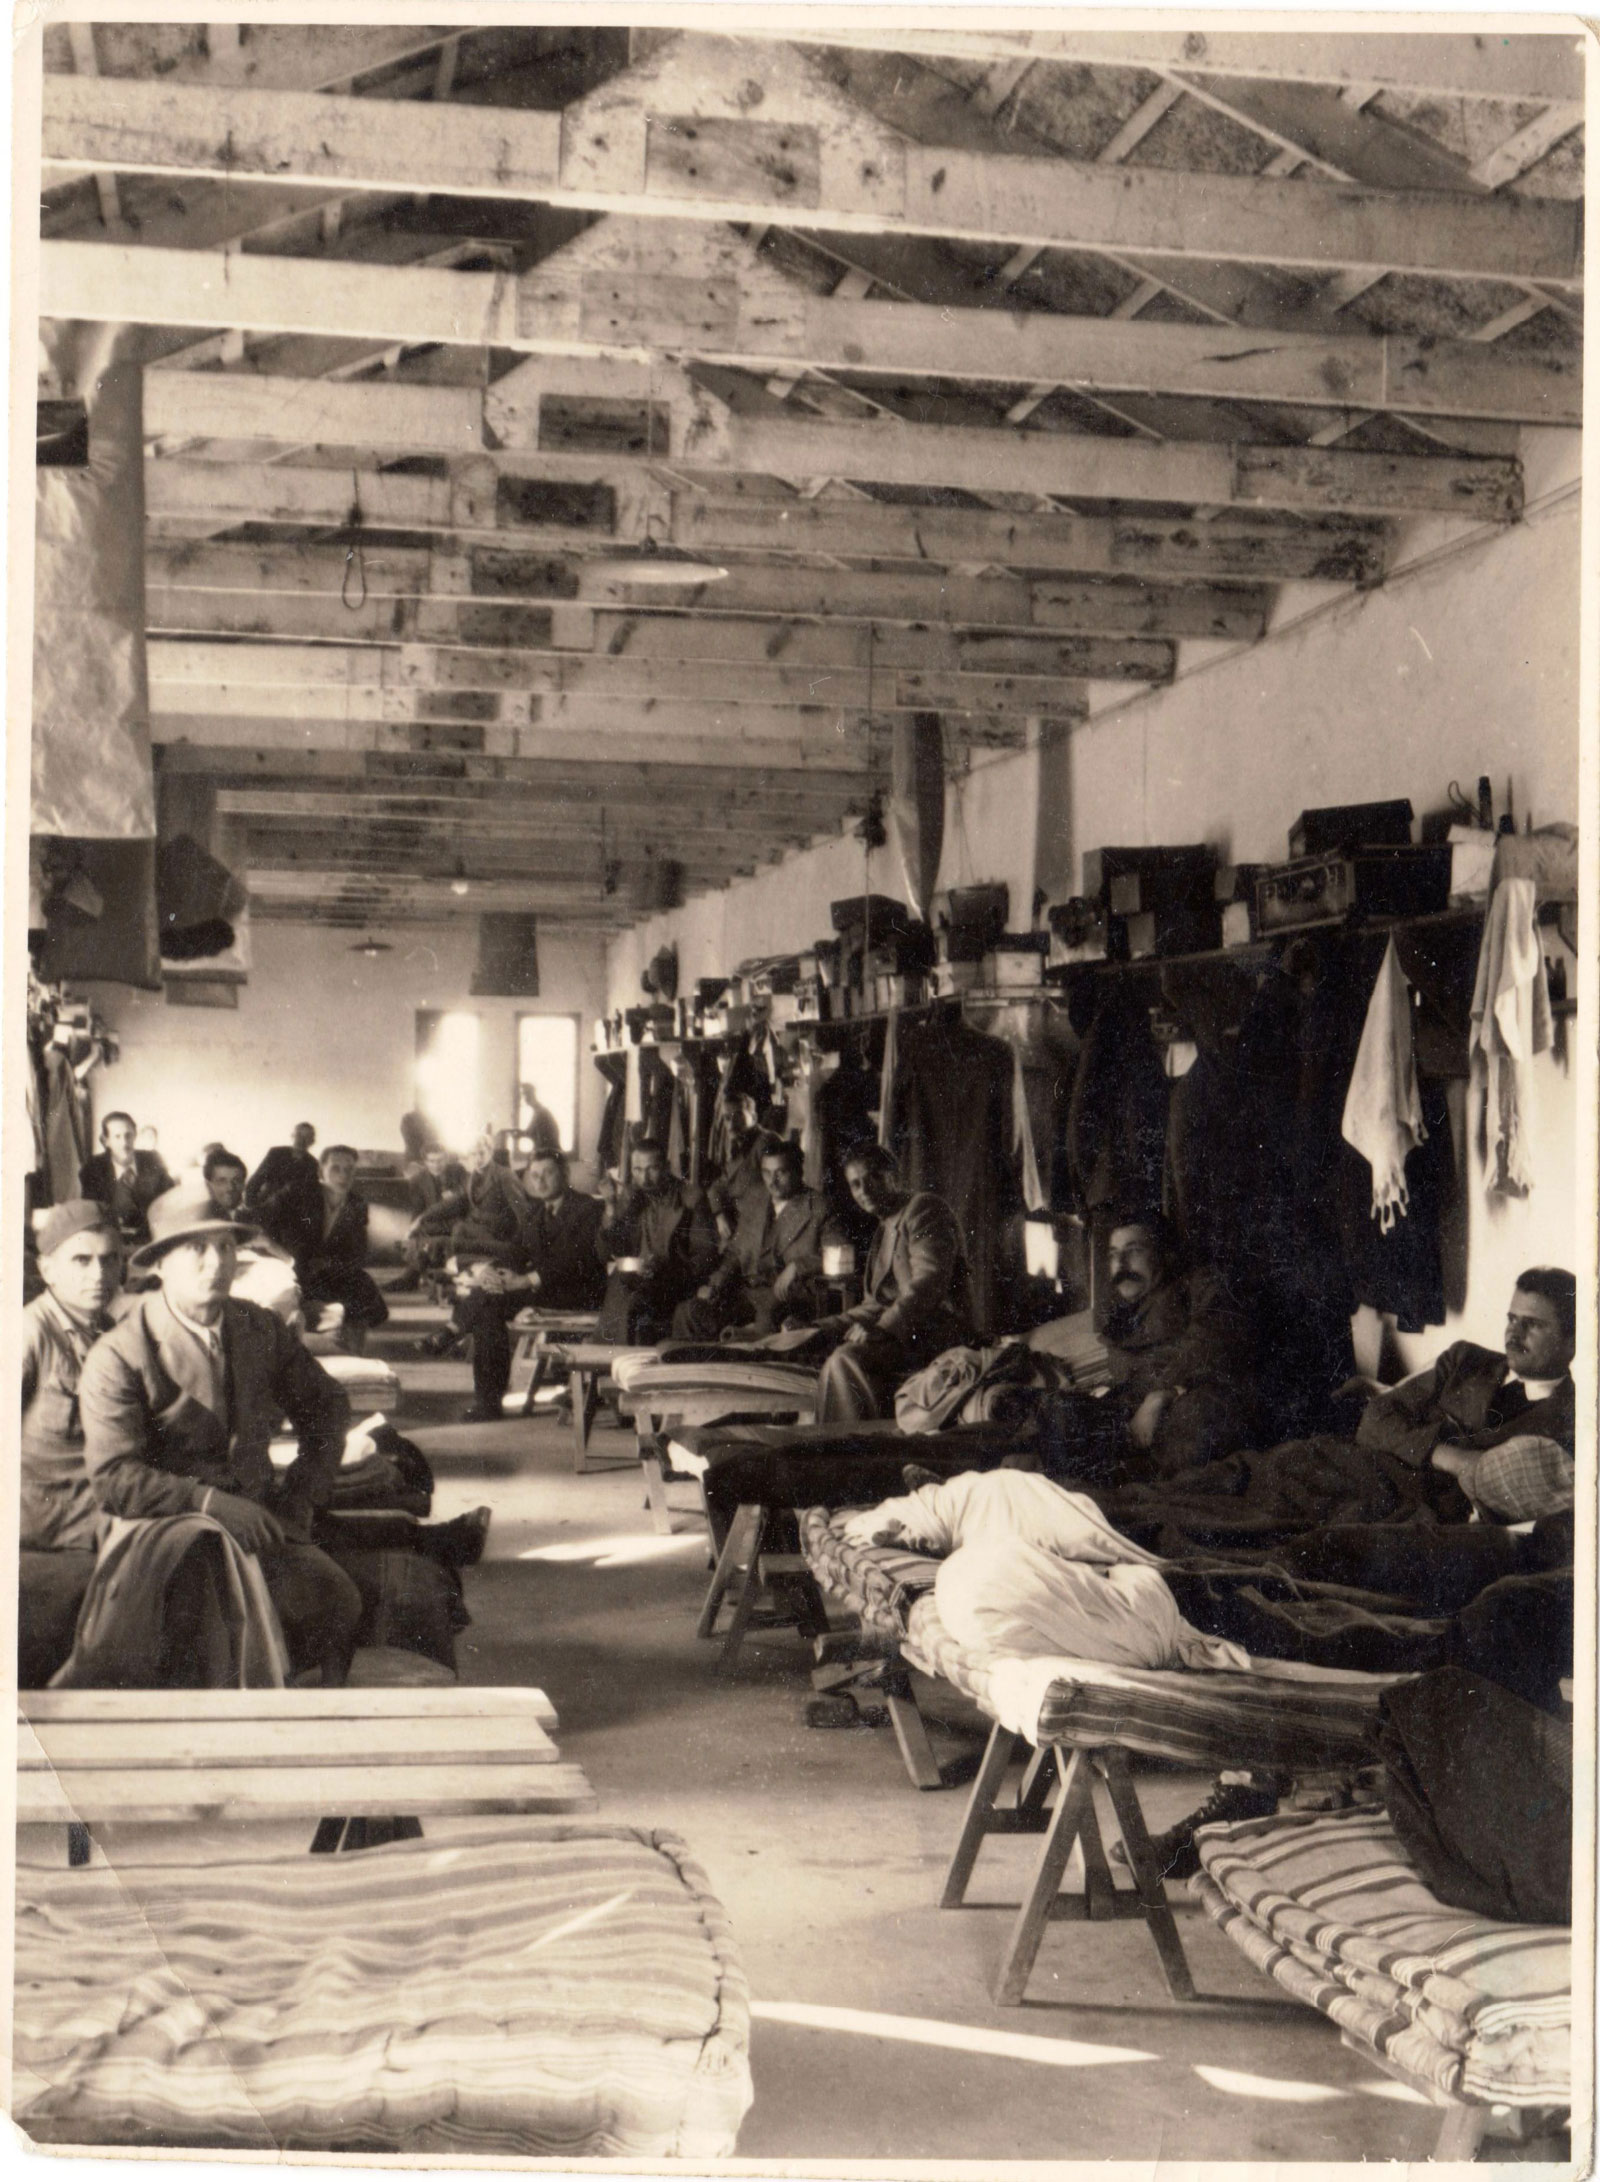 Male internees in the Ferramonti camp, circa 1943